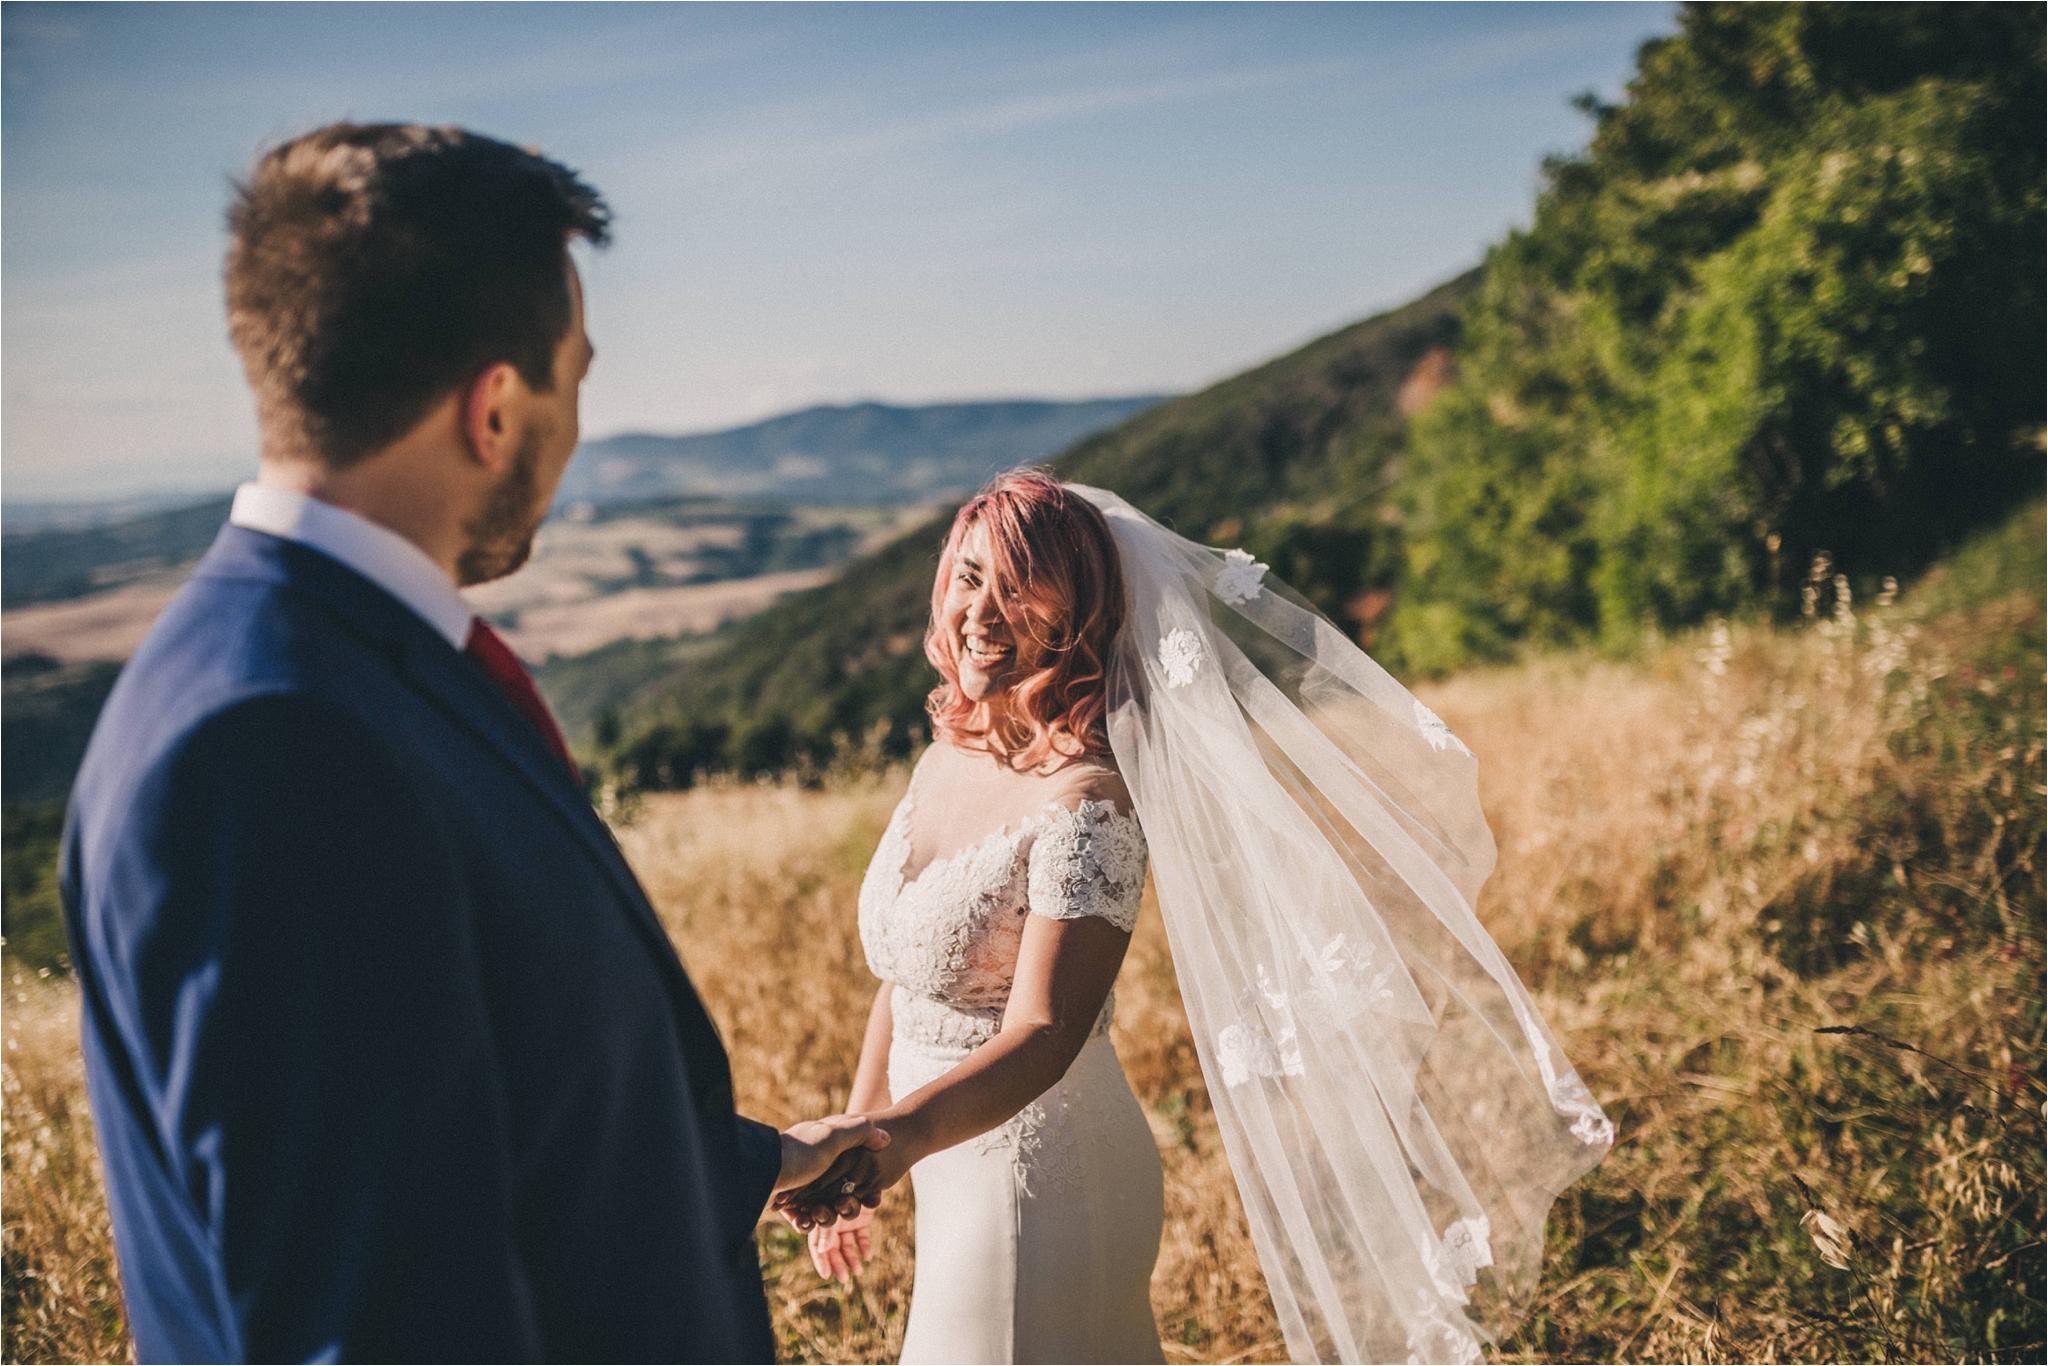 Villa di Ulignano wedding Volterra Tuscany Italy_0076.jpg